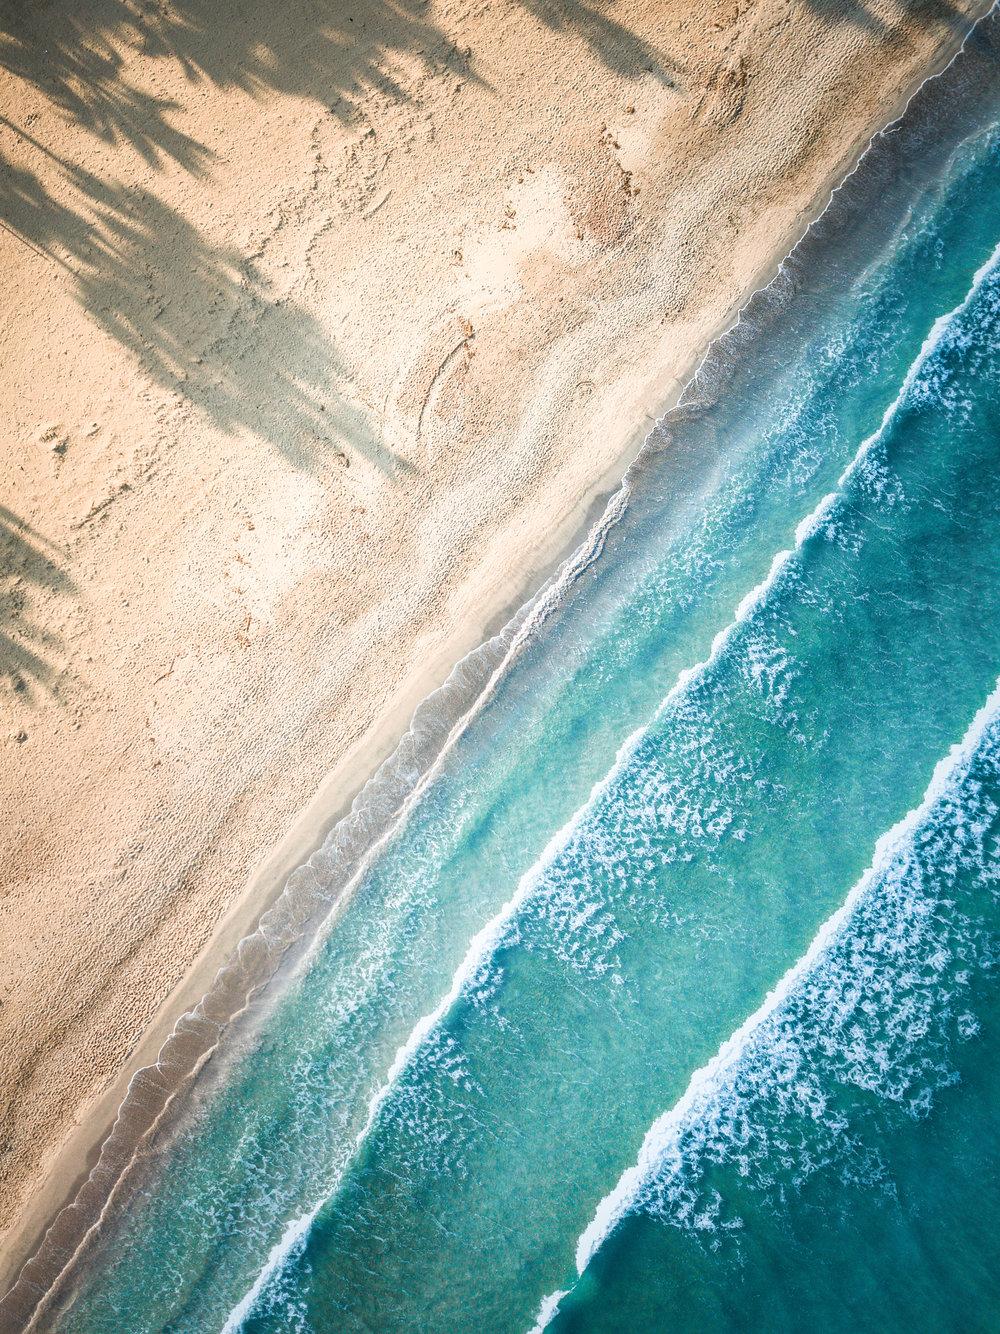 Playa de Muro _ Beach Lines (1 of 1).jpg